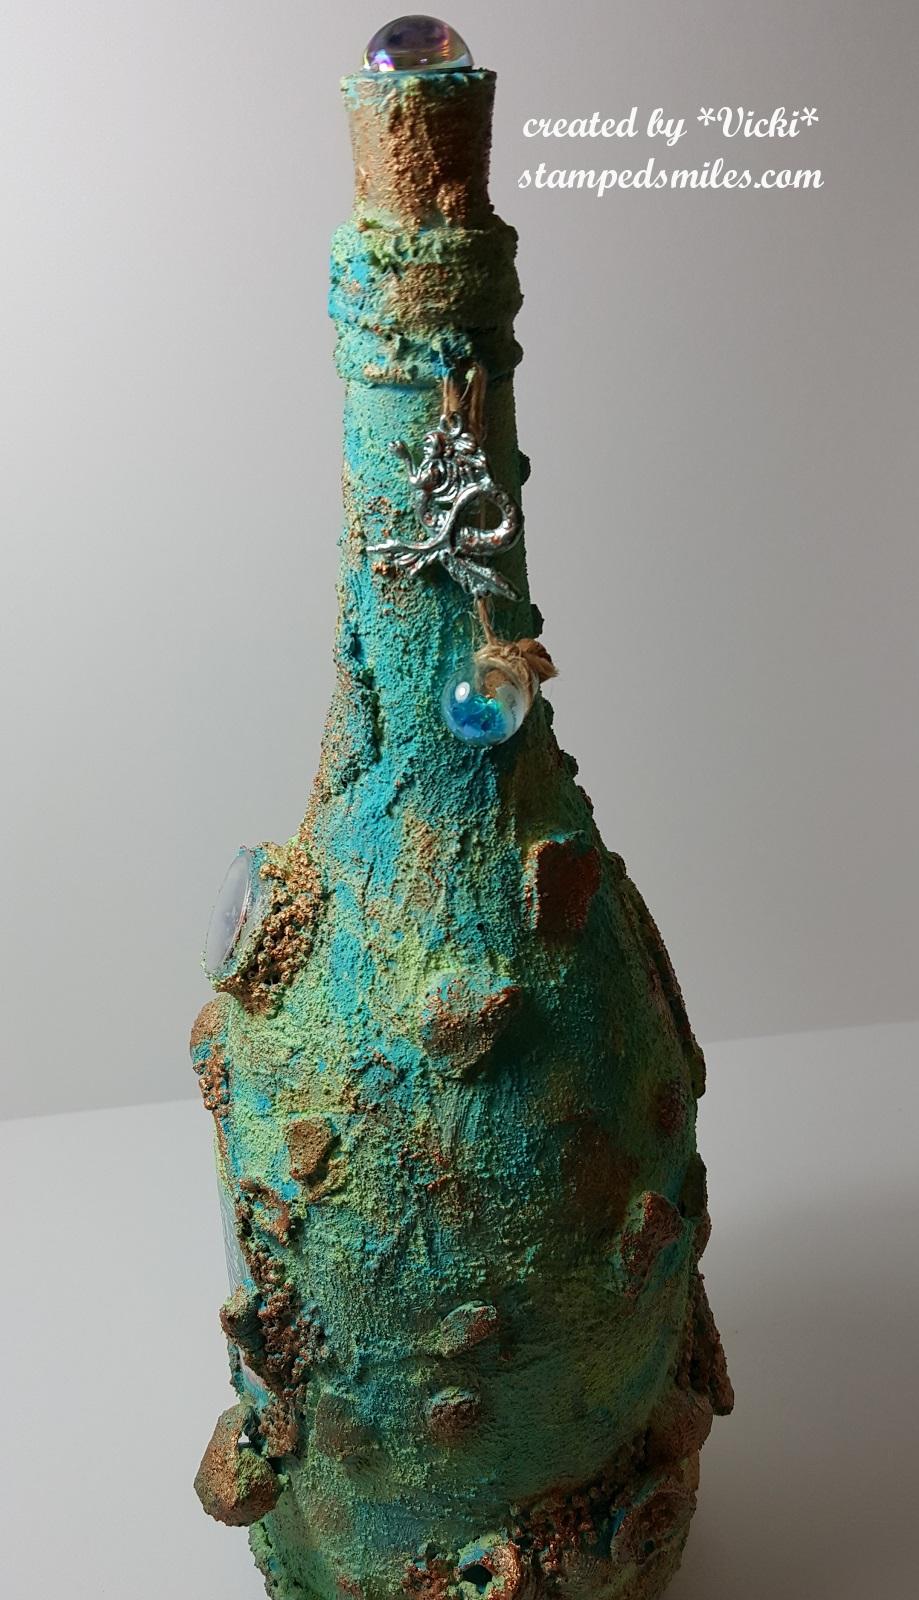 Vicki-Mermaidbotle1